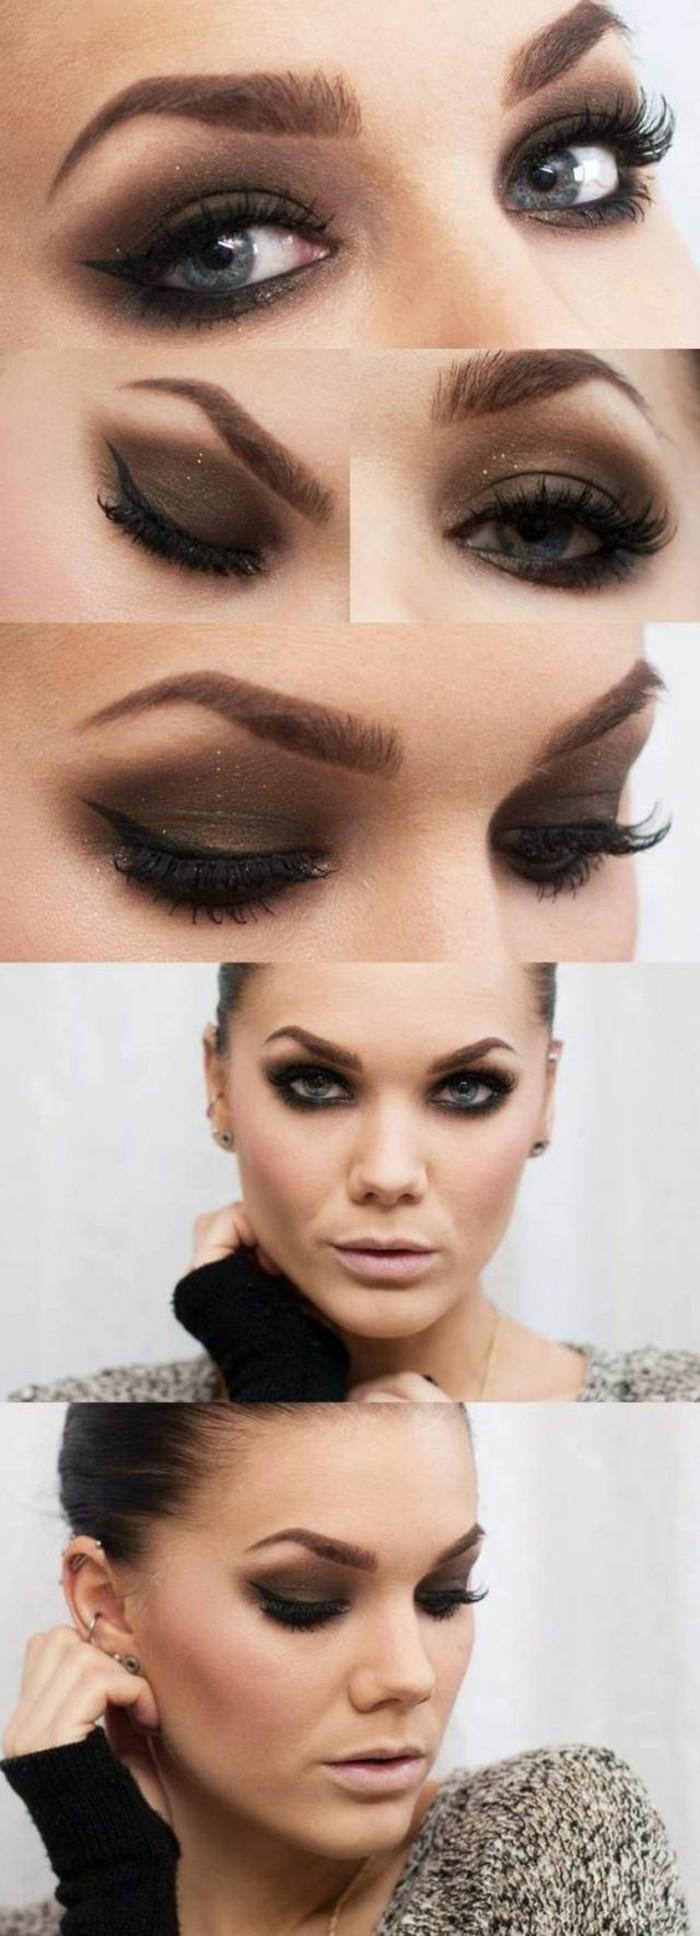 0-smokey-eye-make-up-yeux-bleus-tuto-maquillage-yeux-bleus-comment-maquiller-les-yeux-bleus